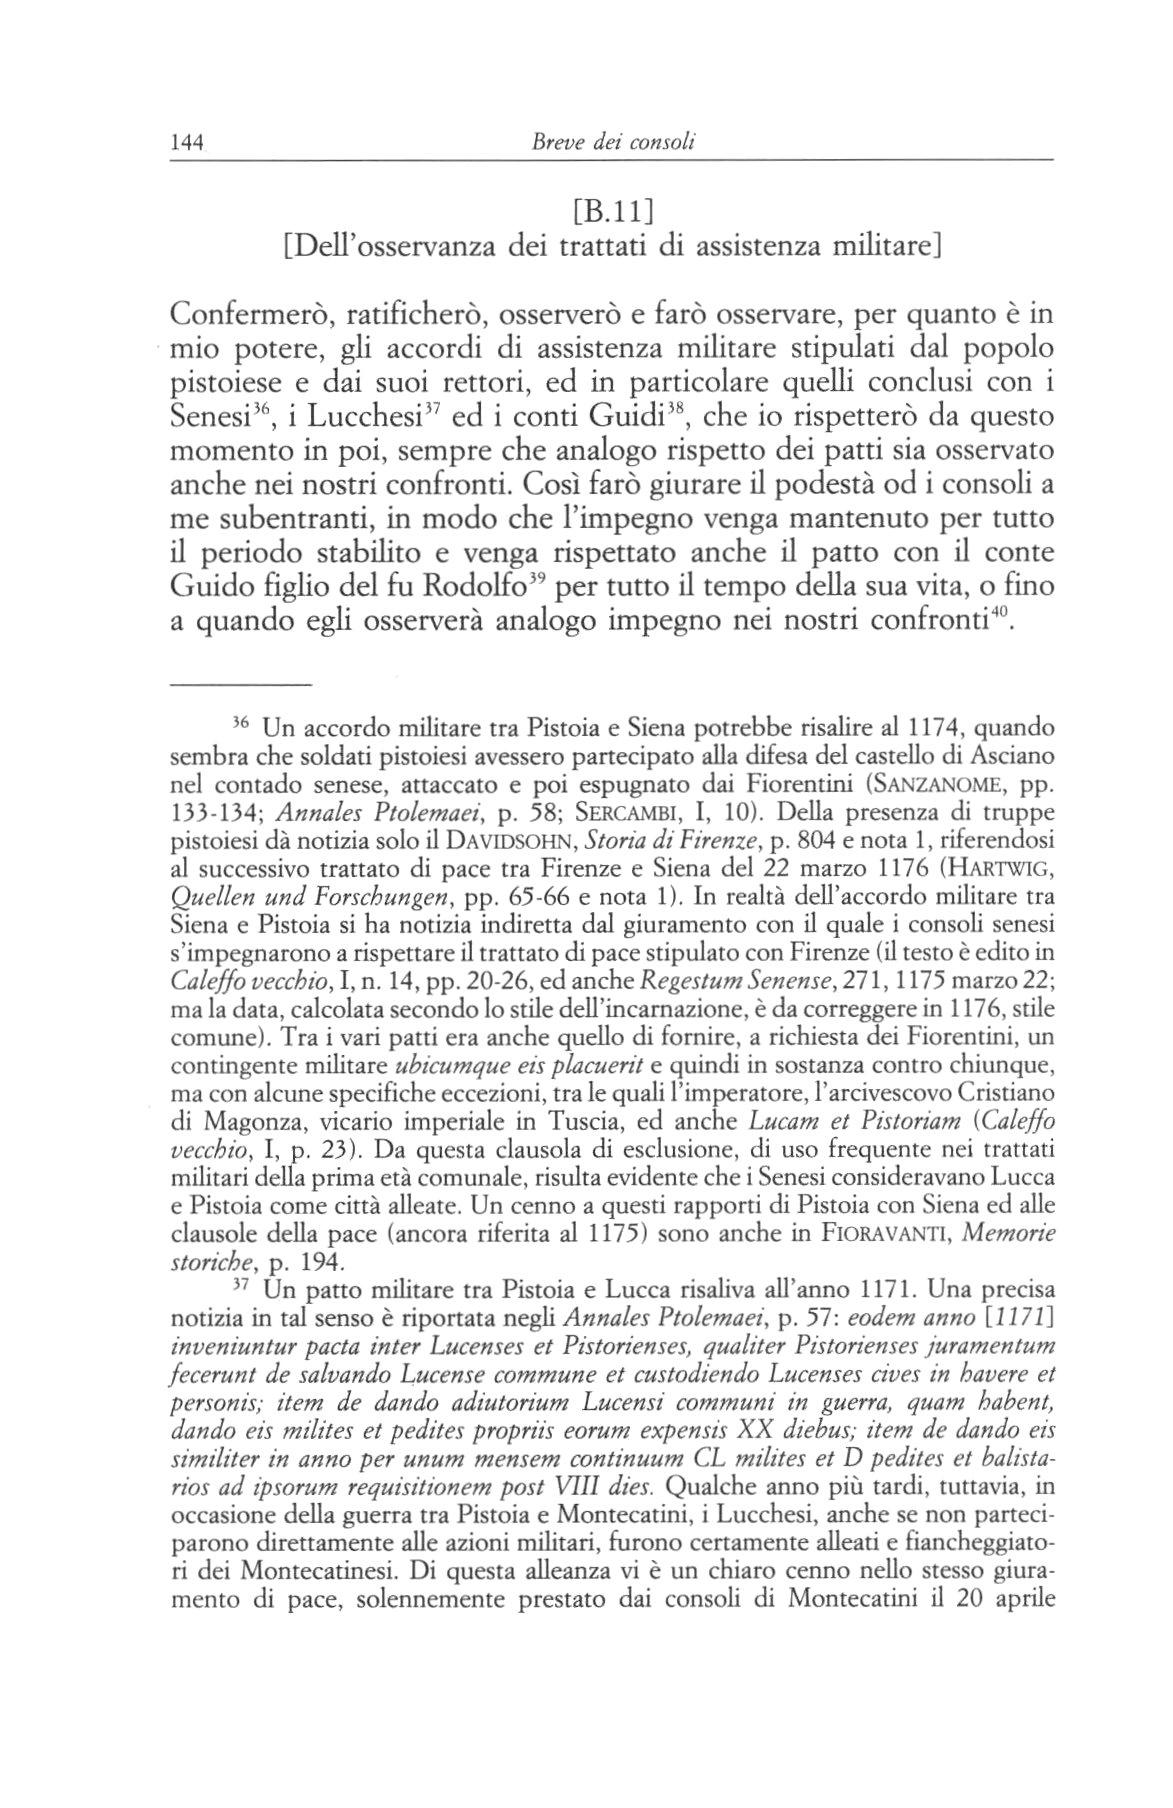 statuti pistoiesi del sec.XII 0144.jpg